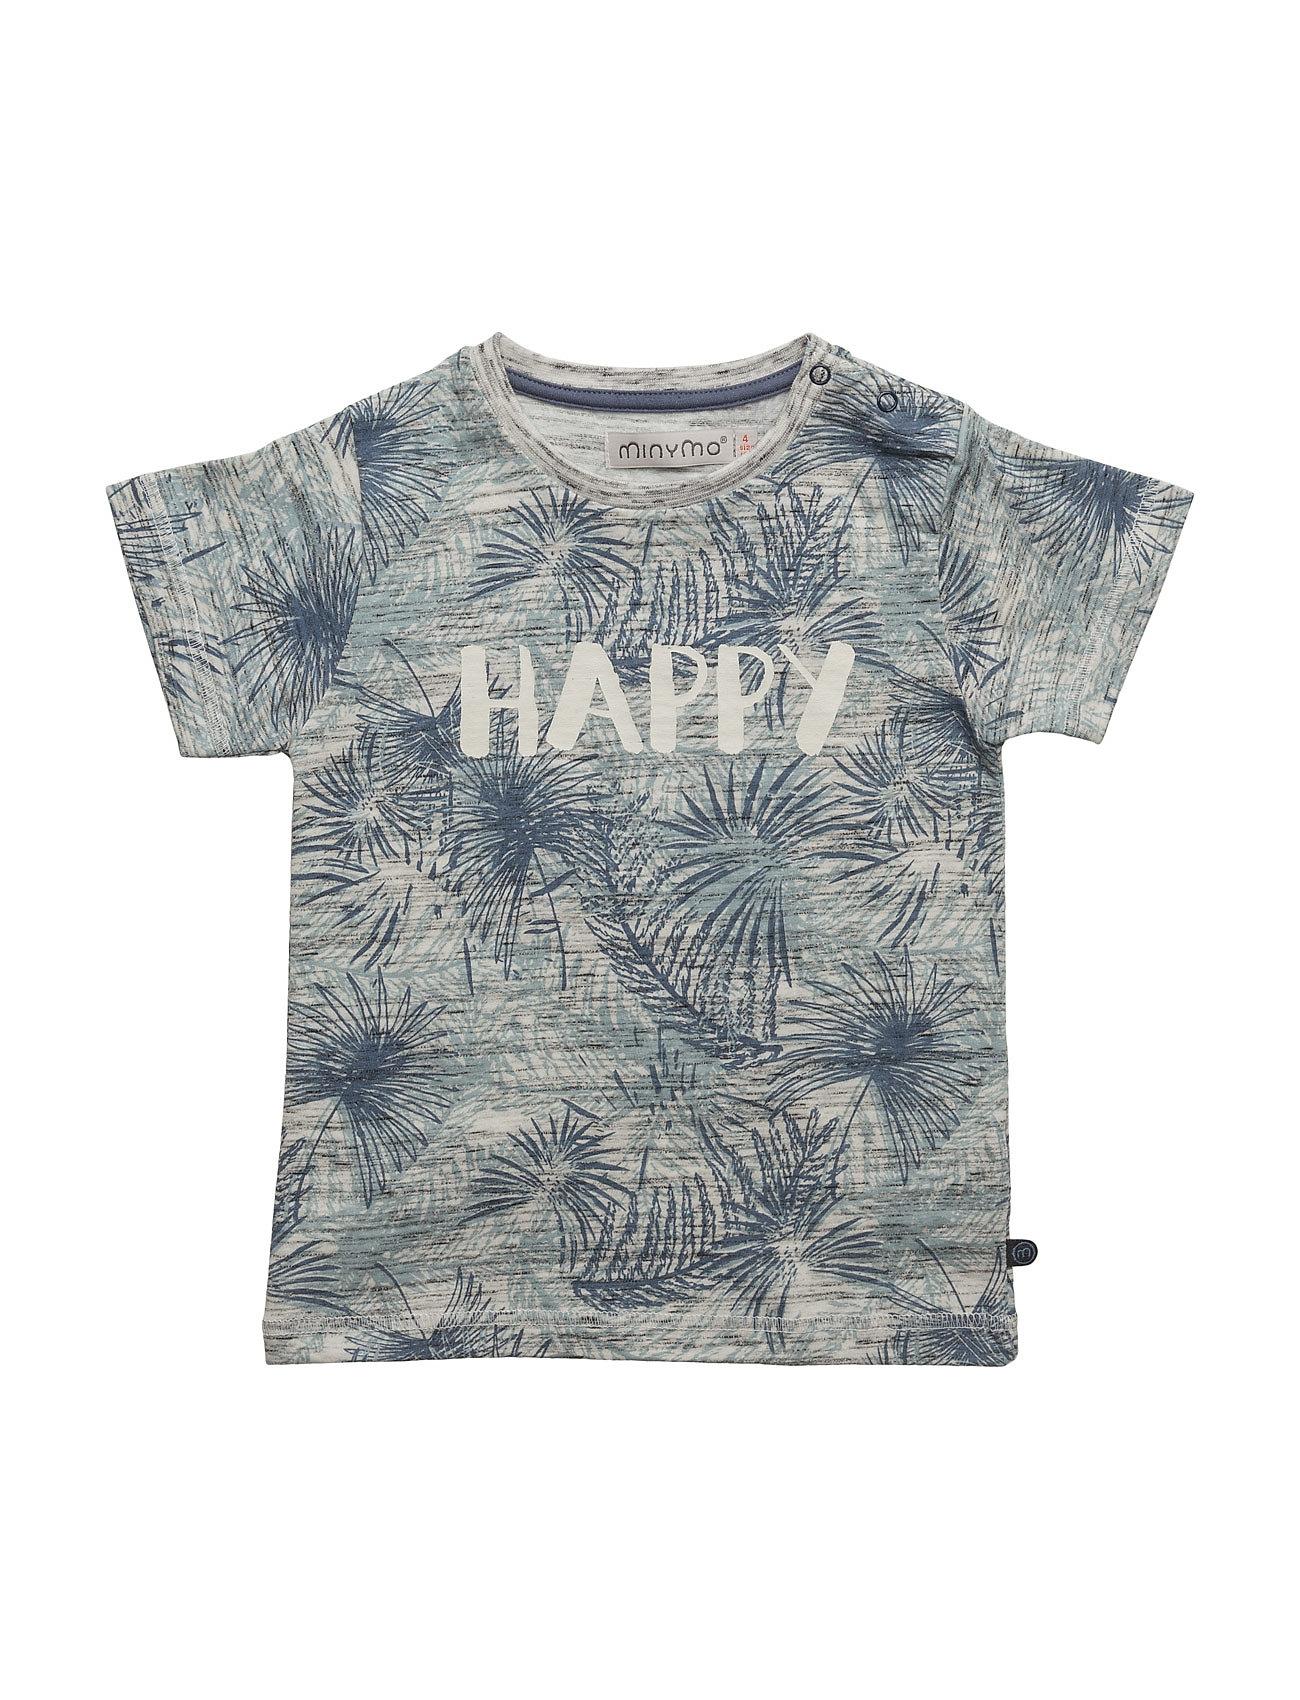 Kato 73-T-Shirt Ss W. Palm Aop Minymo Kortærmede t-shirts til Børn i